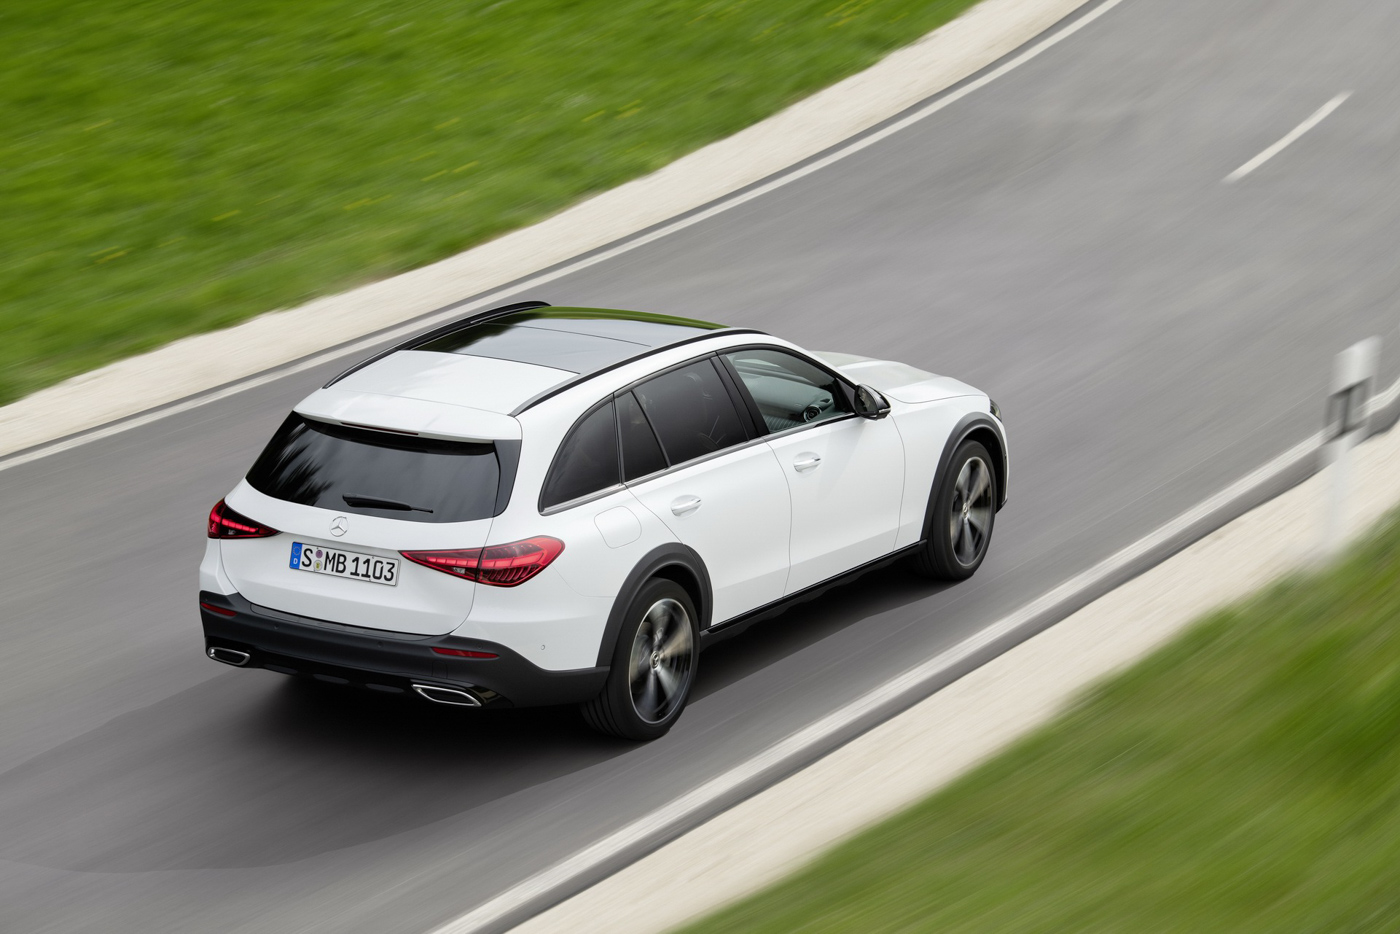 Mercedes-benz-c-class-all-terrain-di-den-moi-noi-cung-mau-xe-gia-dinh-day-thuc-dung (8).JPG